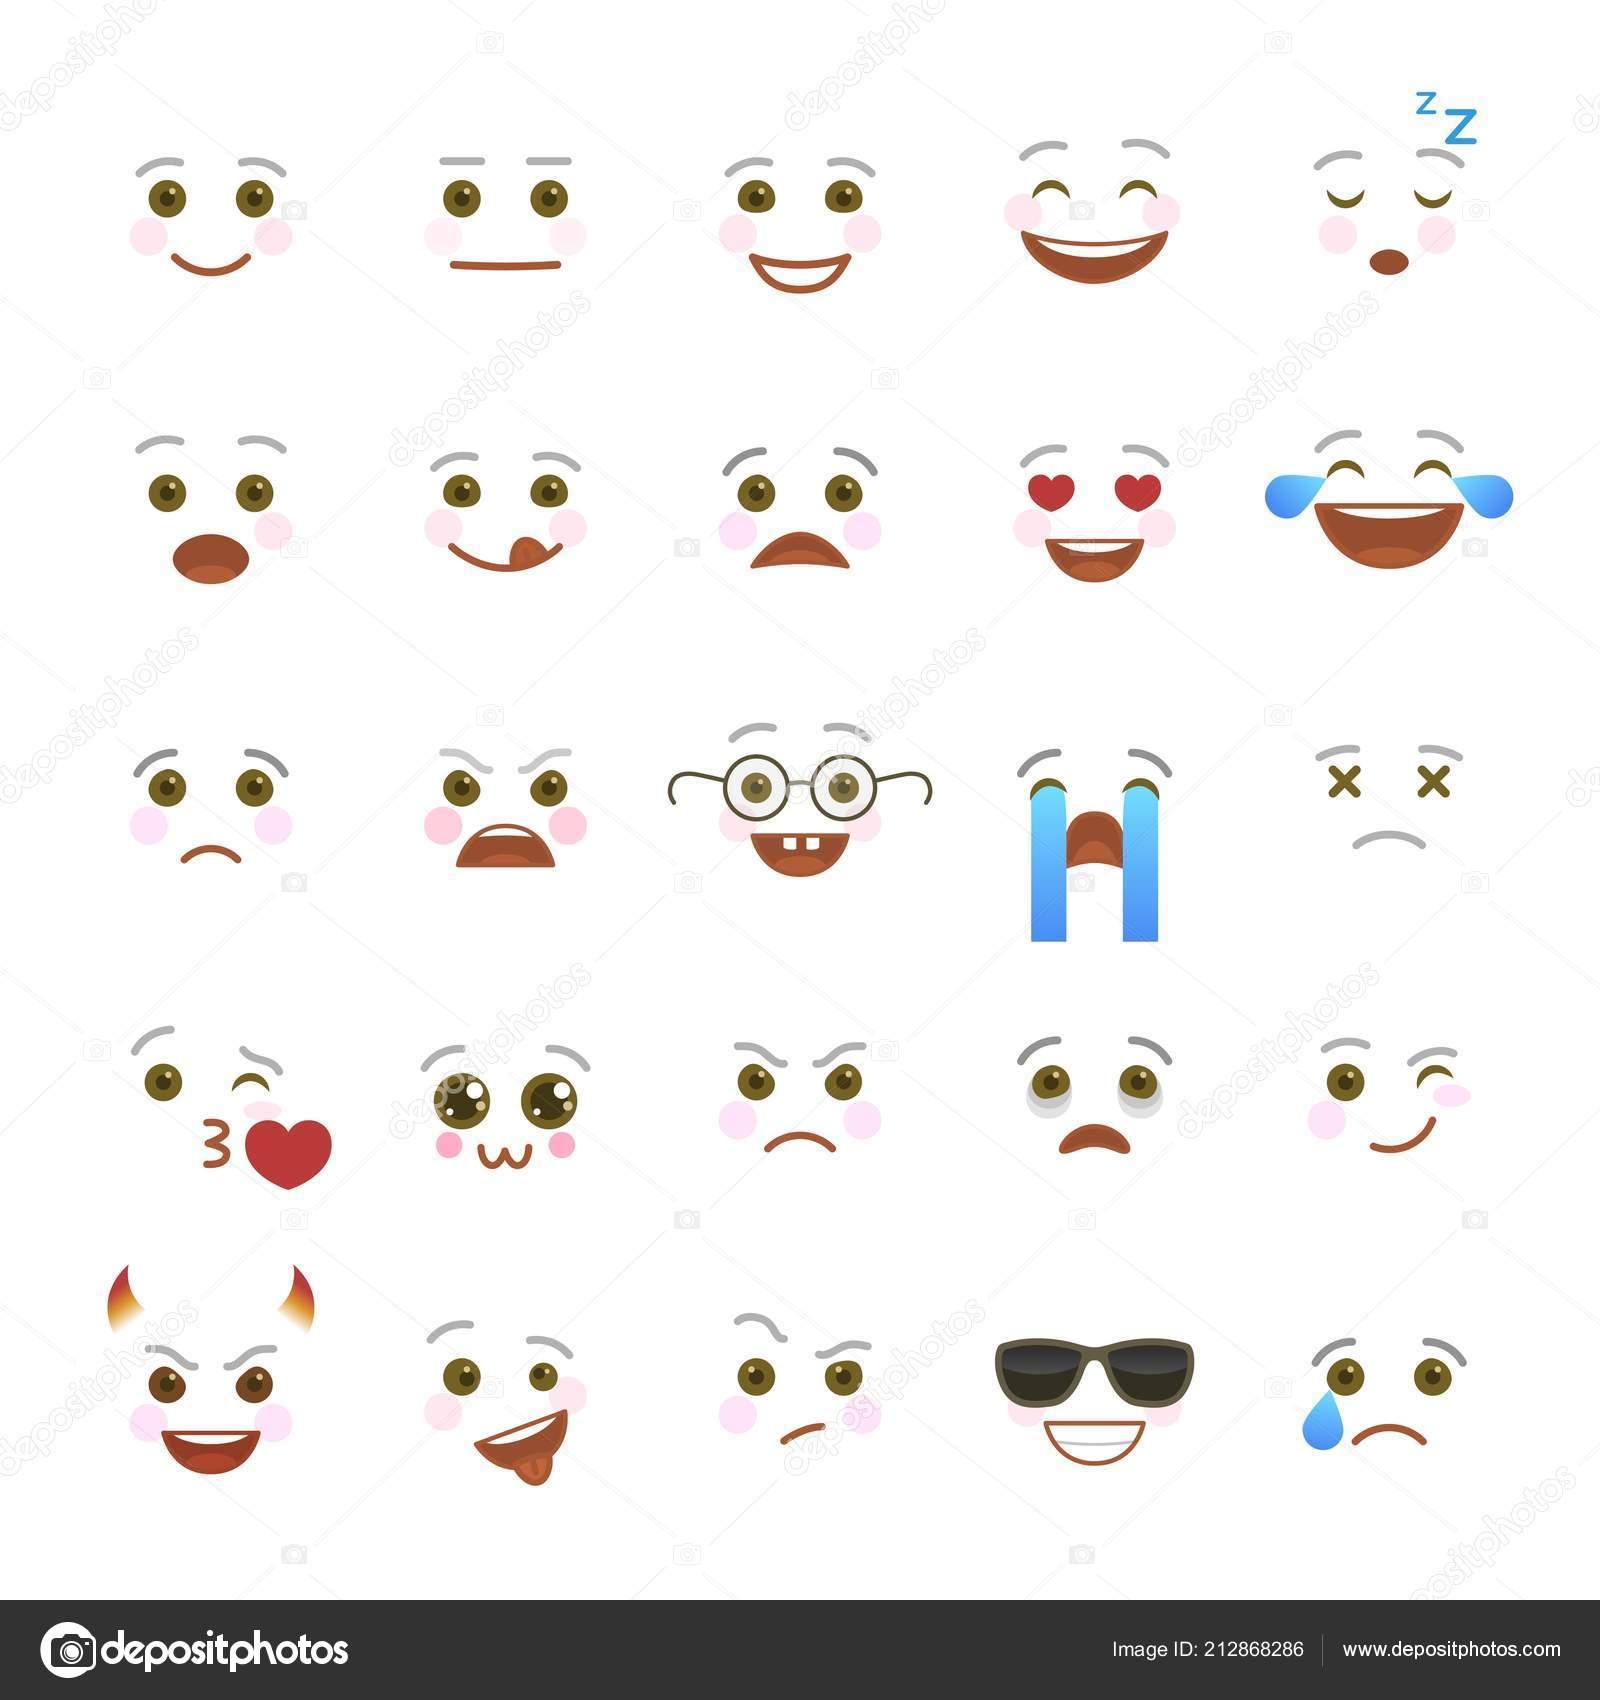 Comic Emoji Symbols For Internet Chatting